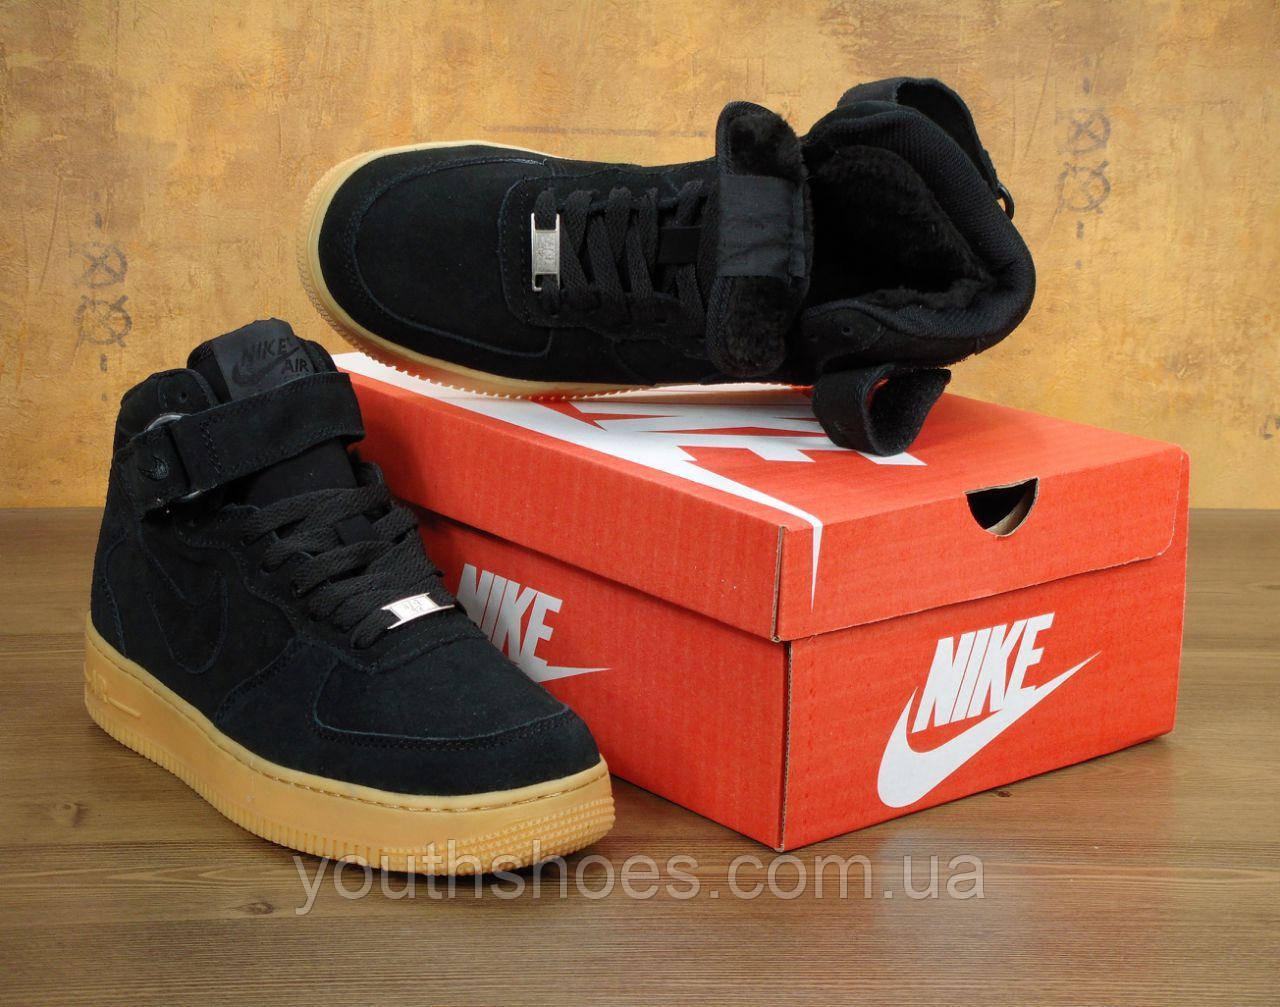 8082eccb Зимние мужские кроссовки Nike Air Force Black Suede Hi р. 40, 41, 43 ...